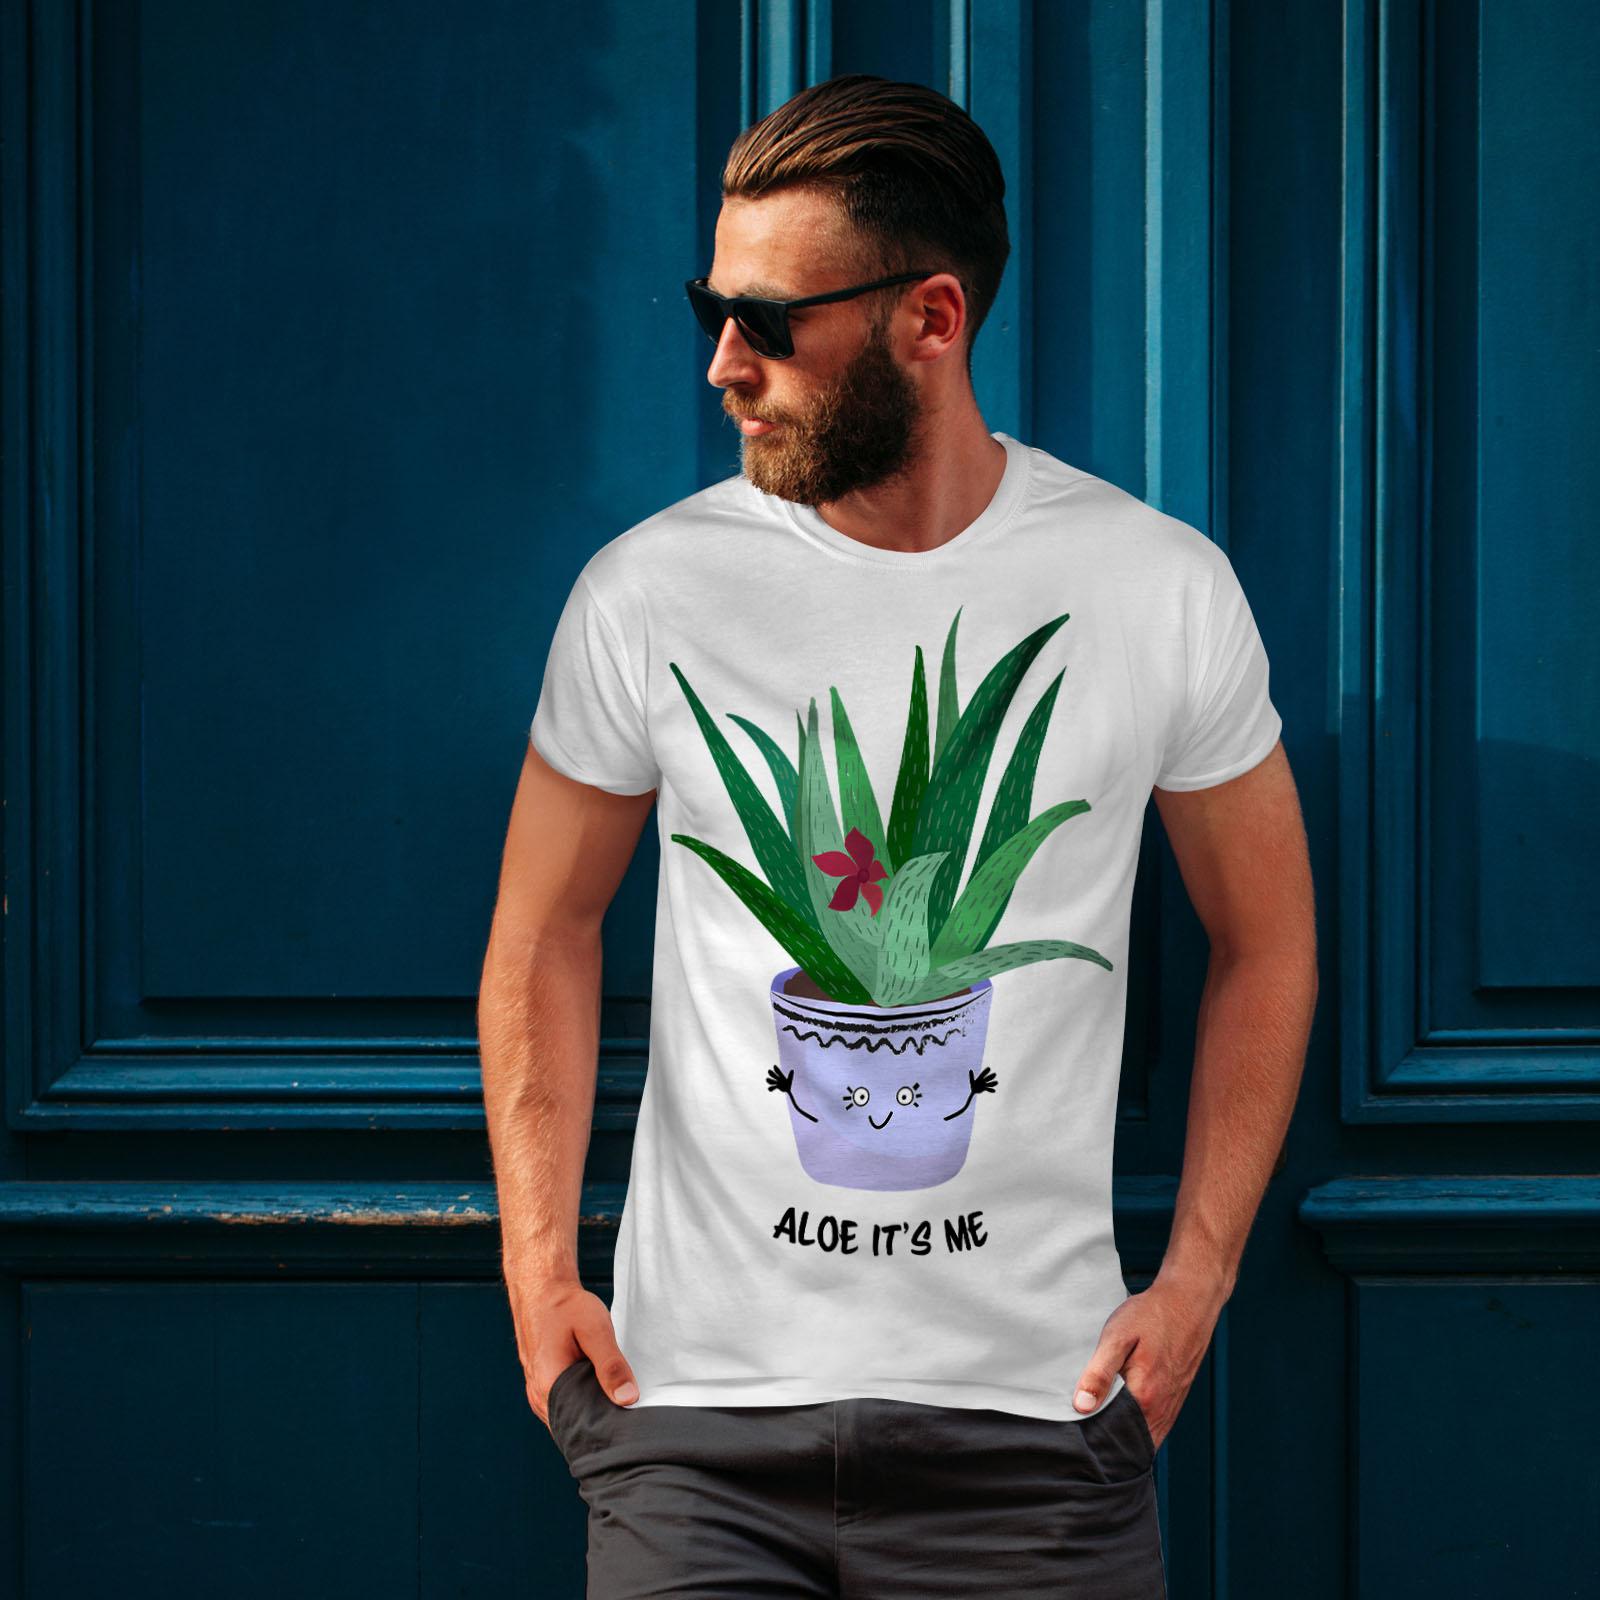 Cute Graphic Design Printed Tee Wellcoda Aloe Hello Me Mens T-shirt